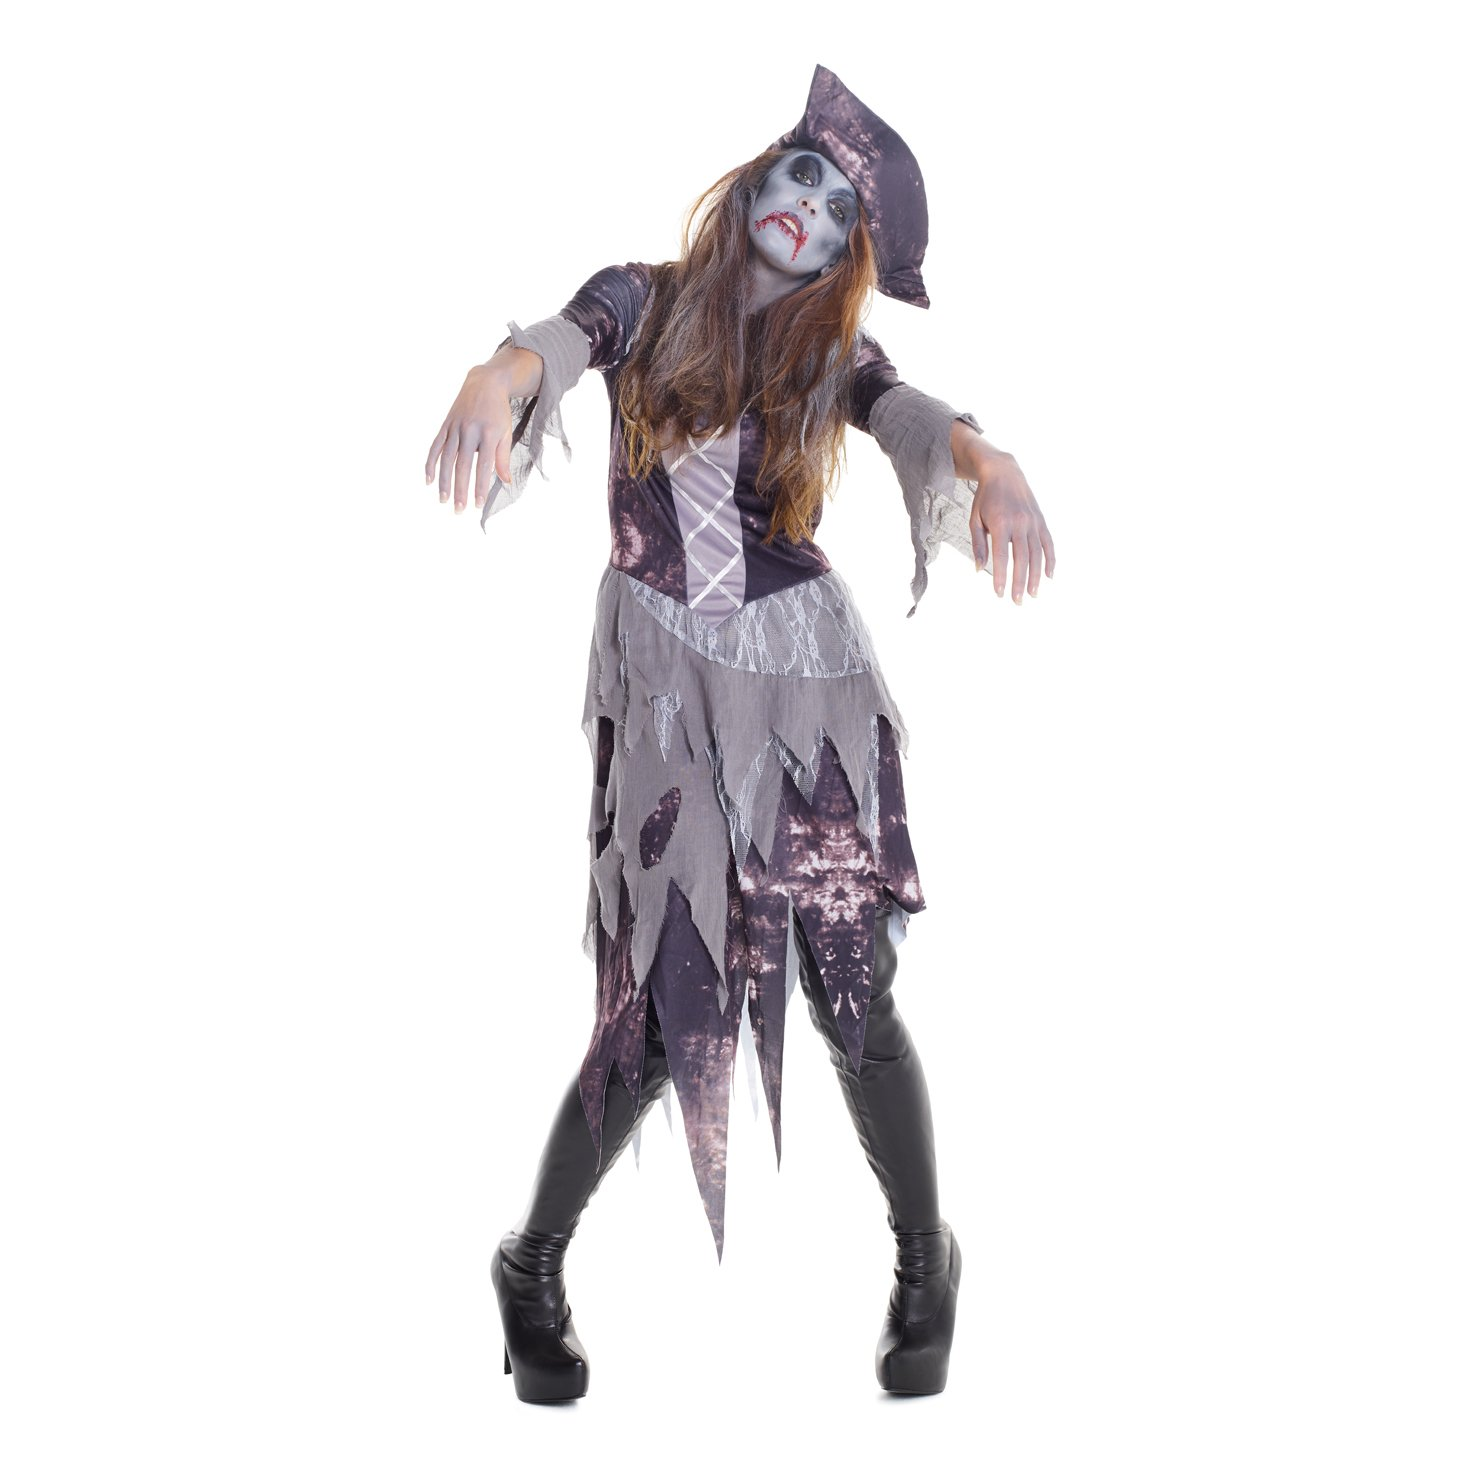 Boys Zombie Pirate Ghost Ship Halloween Kids Fancy Dress Costume